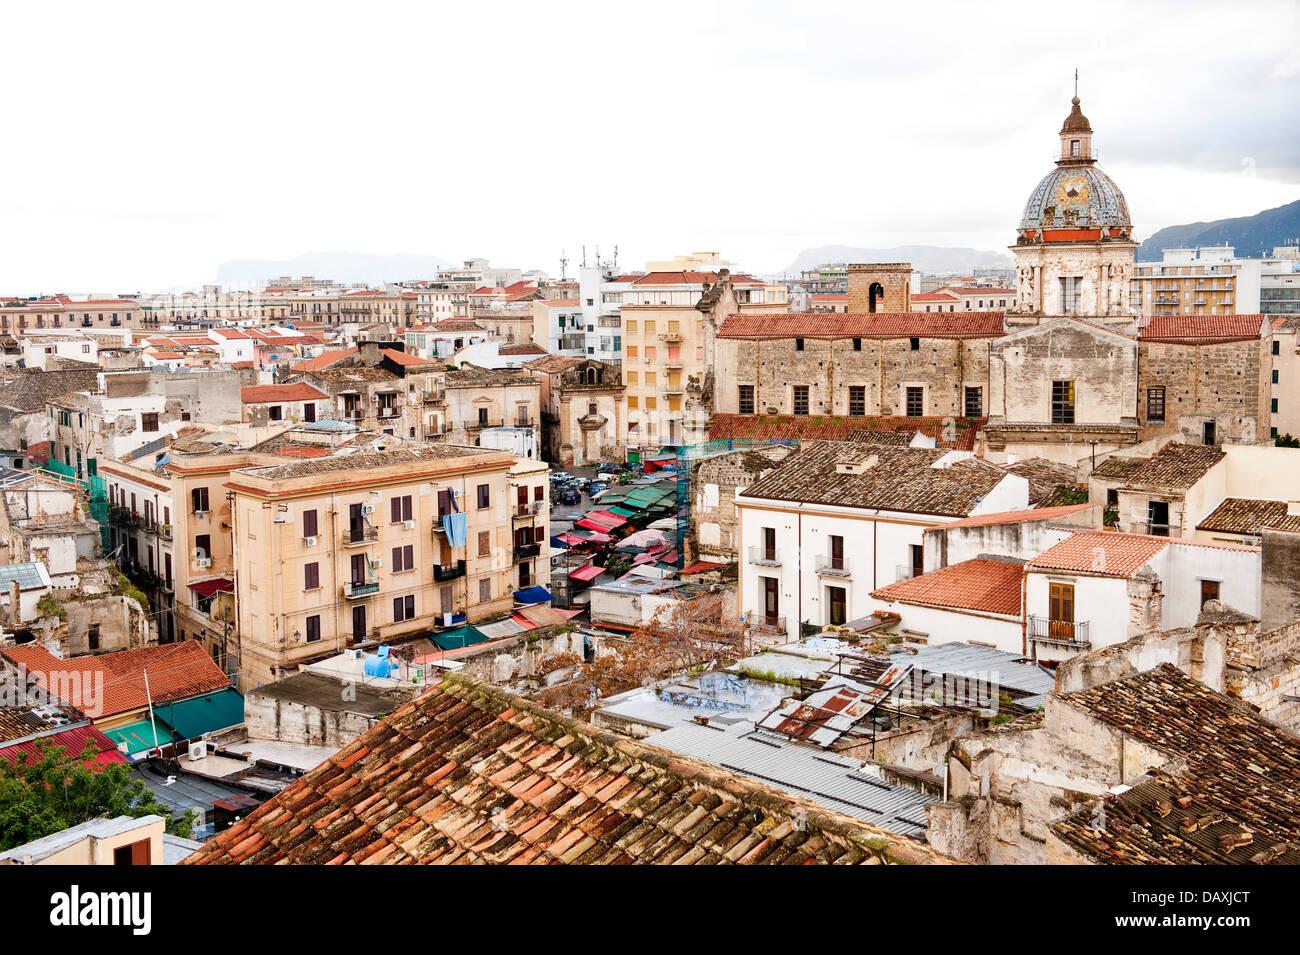 View over Ballaro markets, Palermo, Sicily, Italy - Stock Image